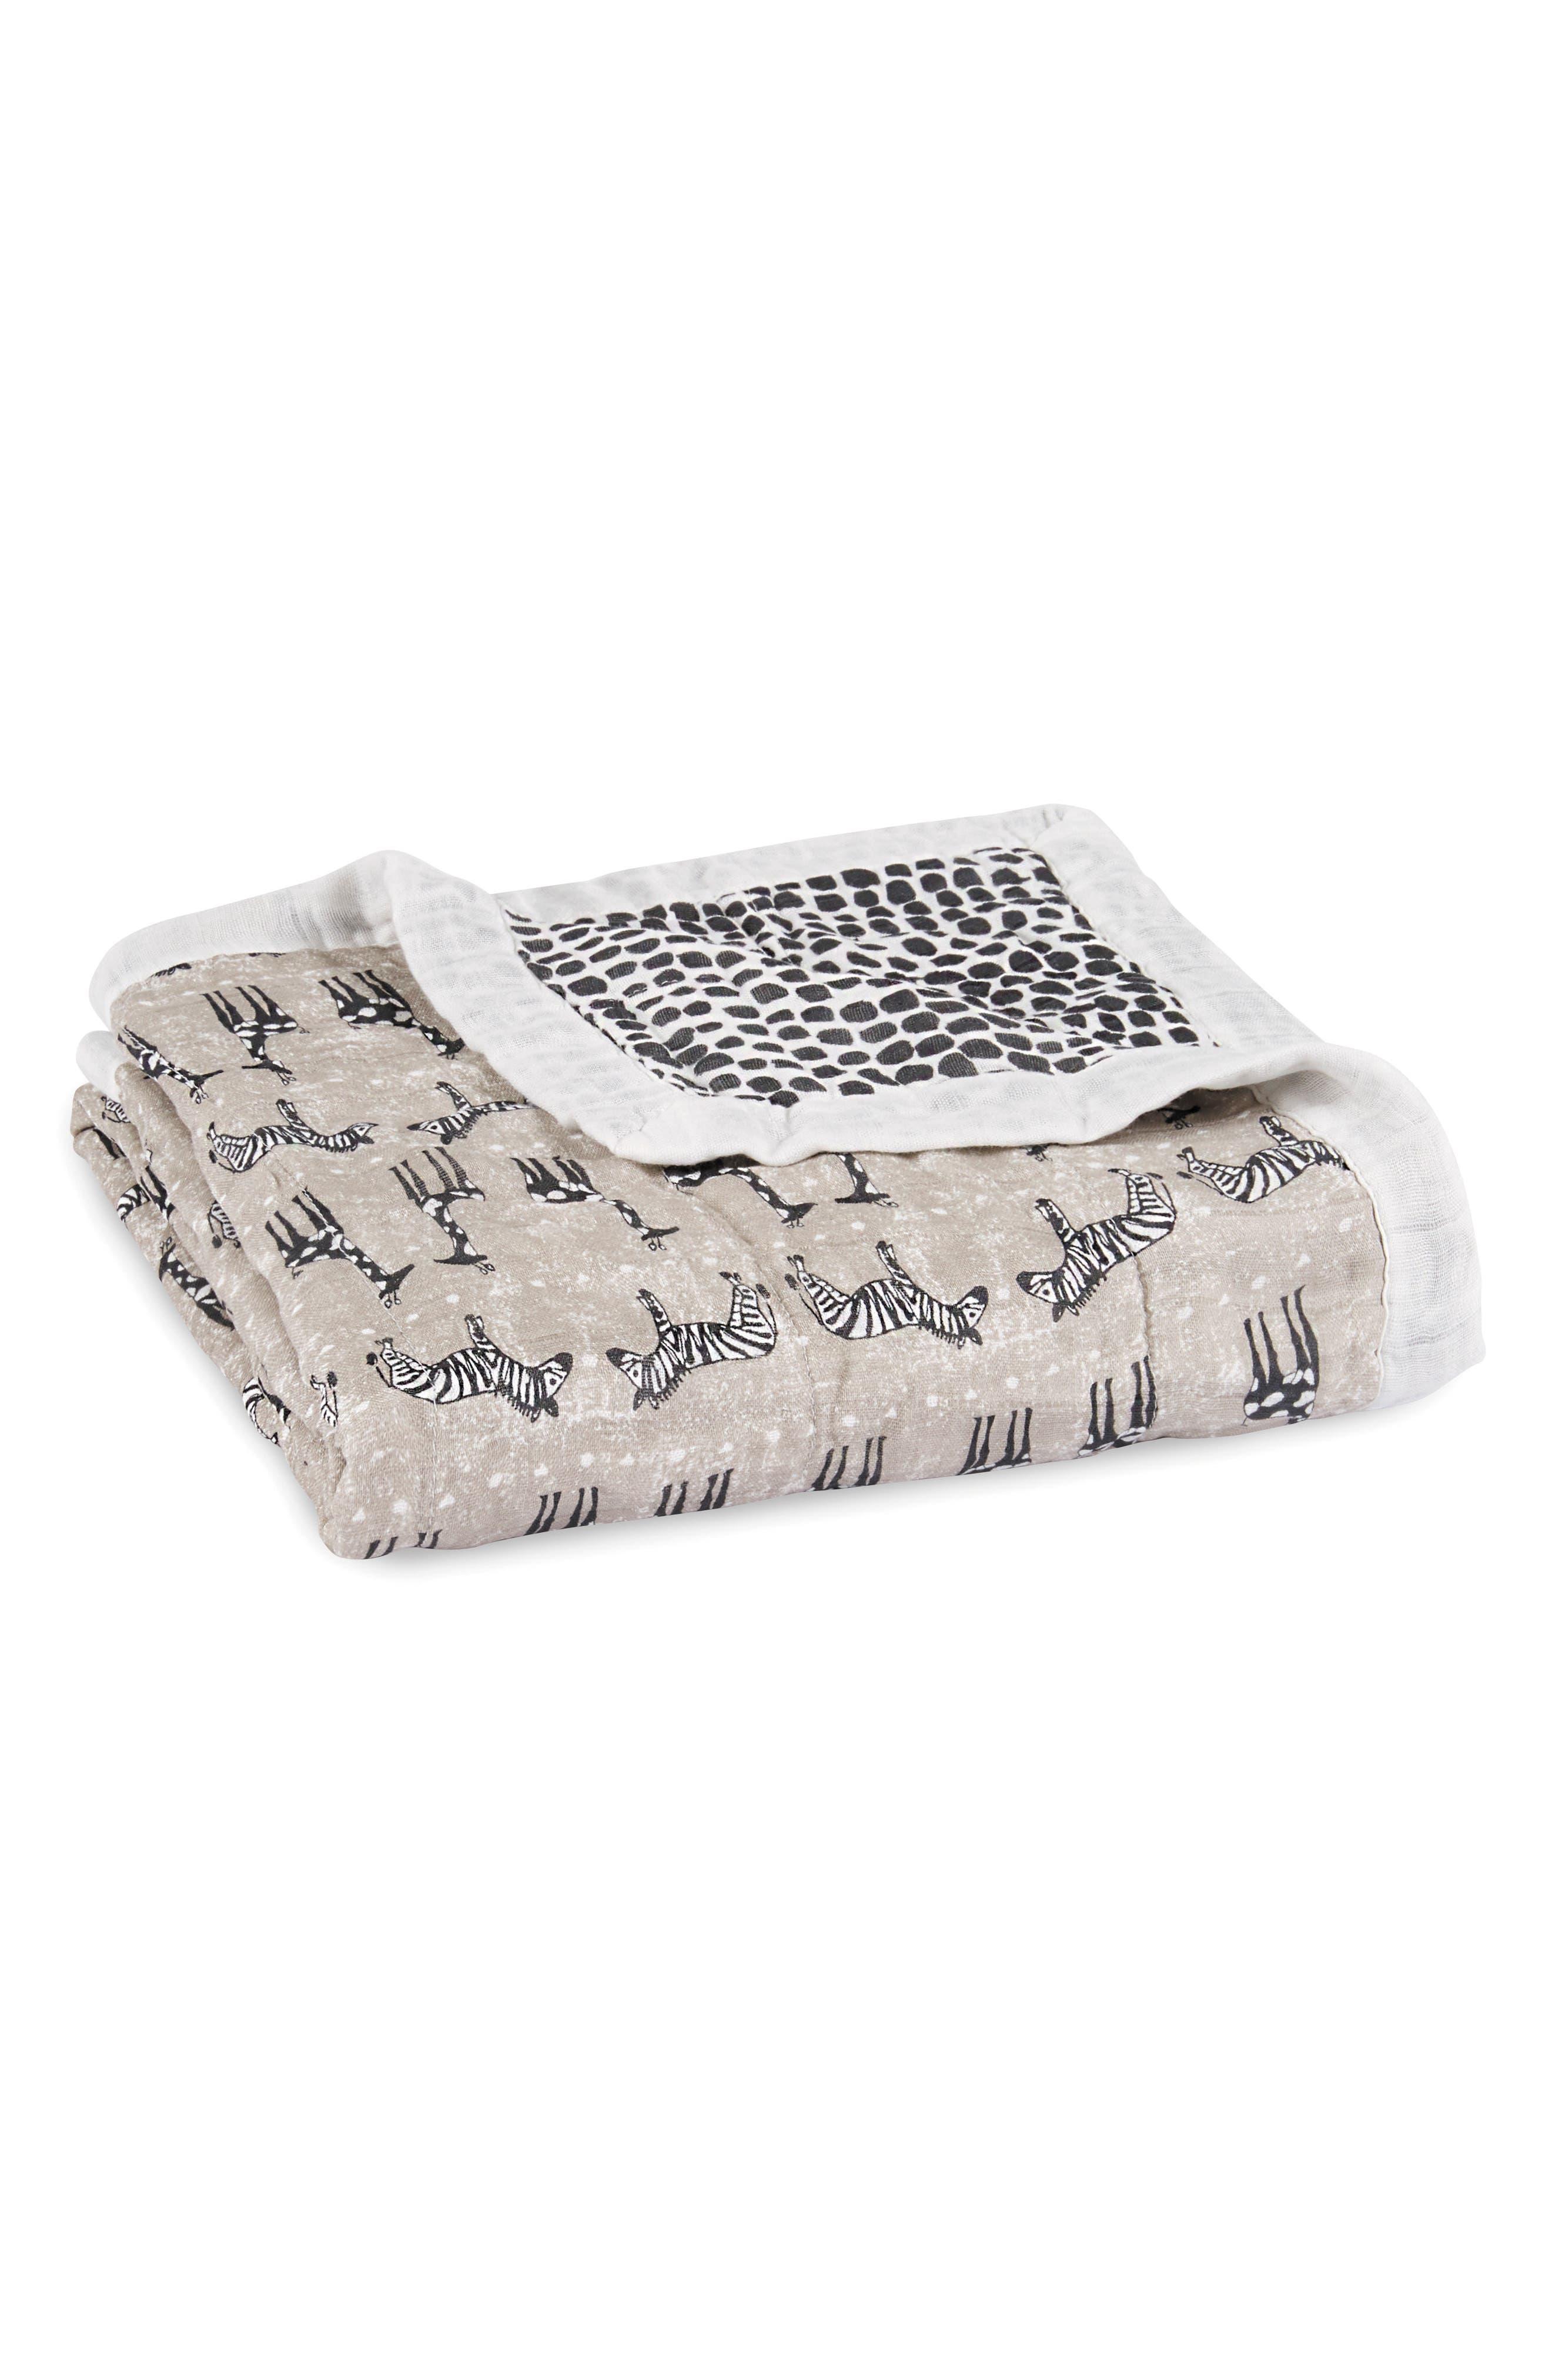 ADEN + ANAIS 'Silky Soft Dream' Blanket, Main, color, SAHARA MOTIF